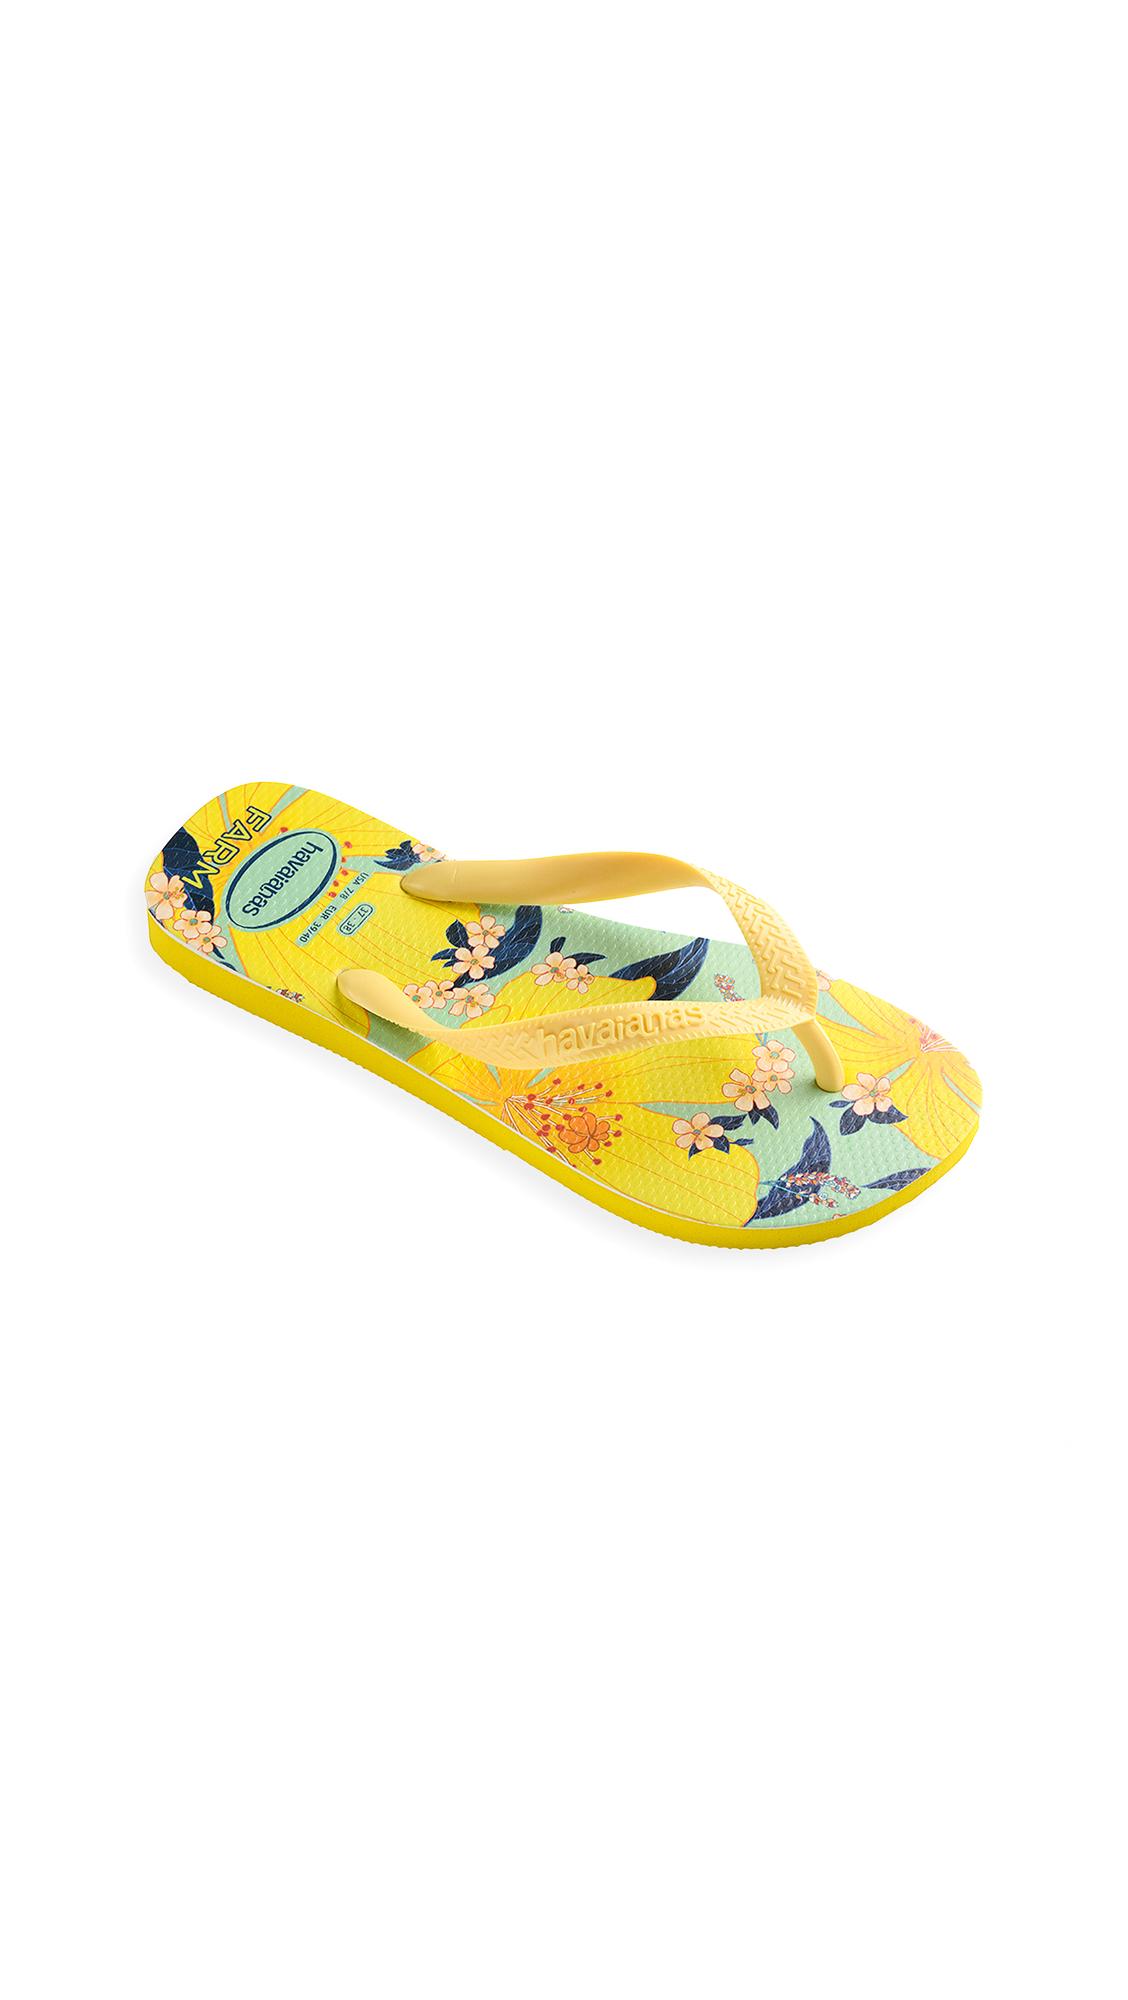 Buy Havaianas x Farm Rio Flowers Sandals Citrus online, shop Havaianas